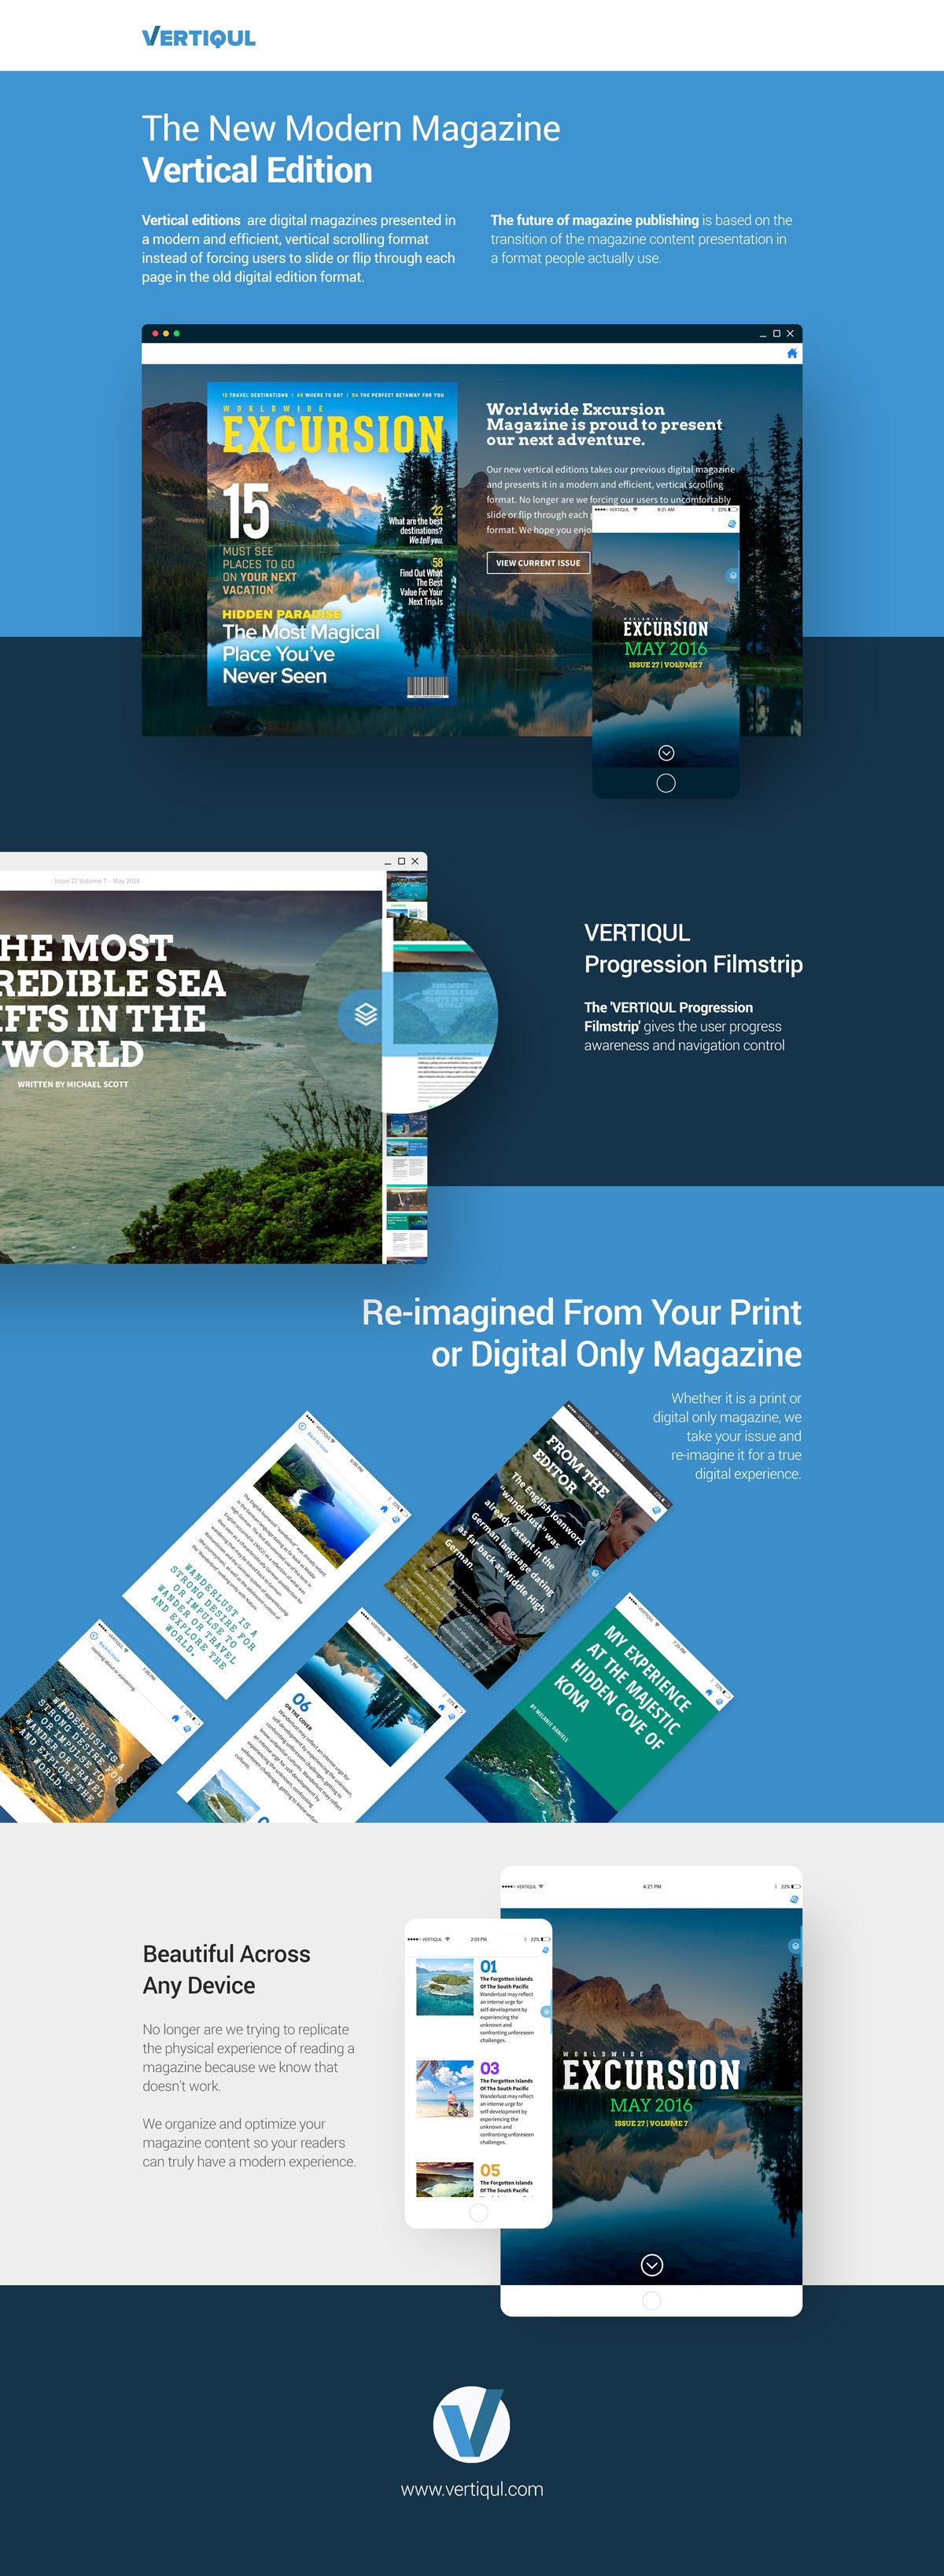 VERTIQUL - Vertical Editions Publishing Platform